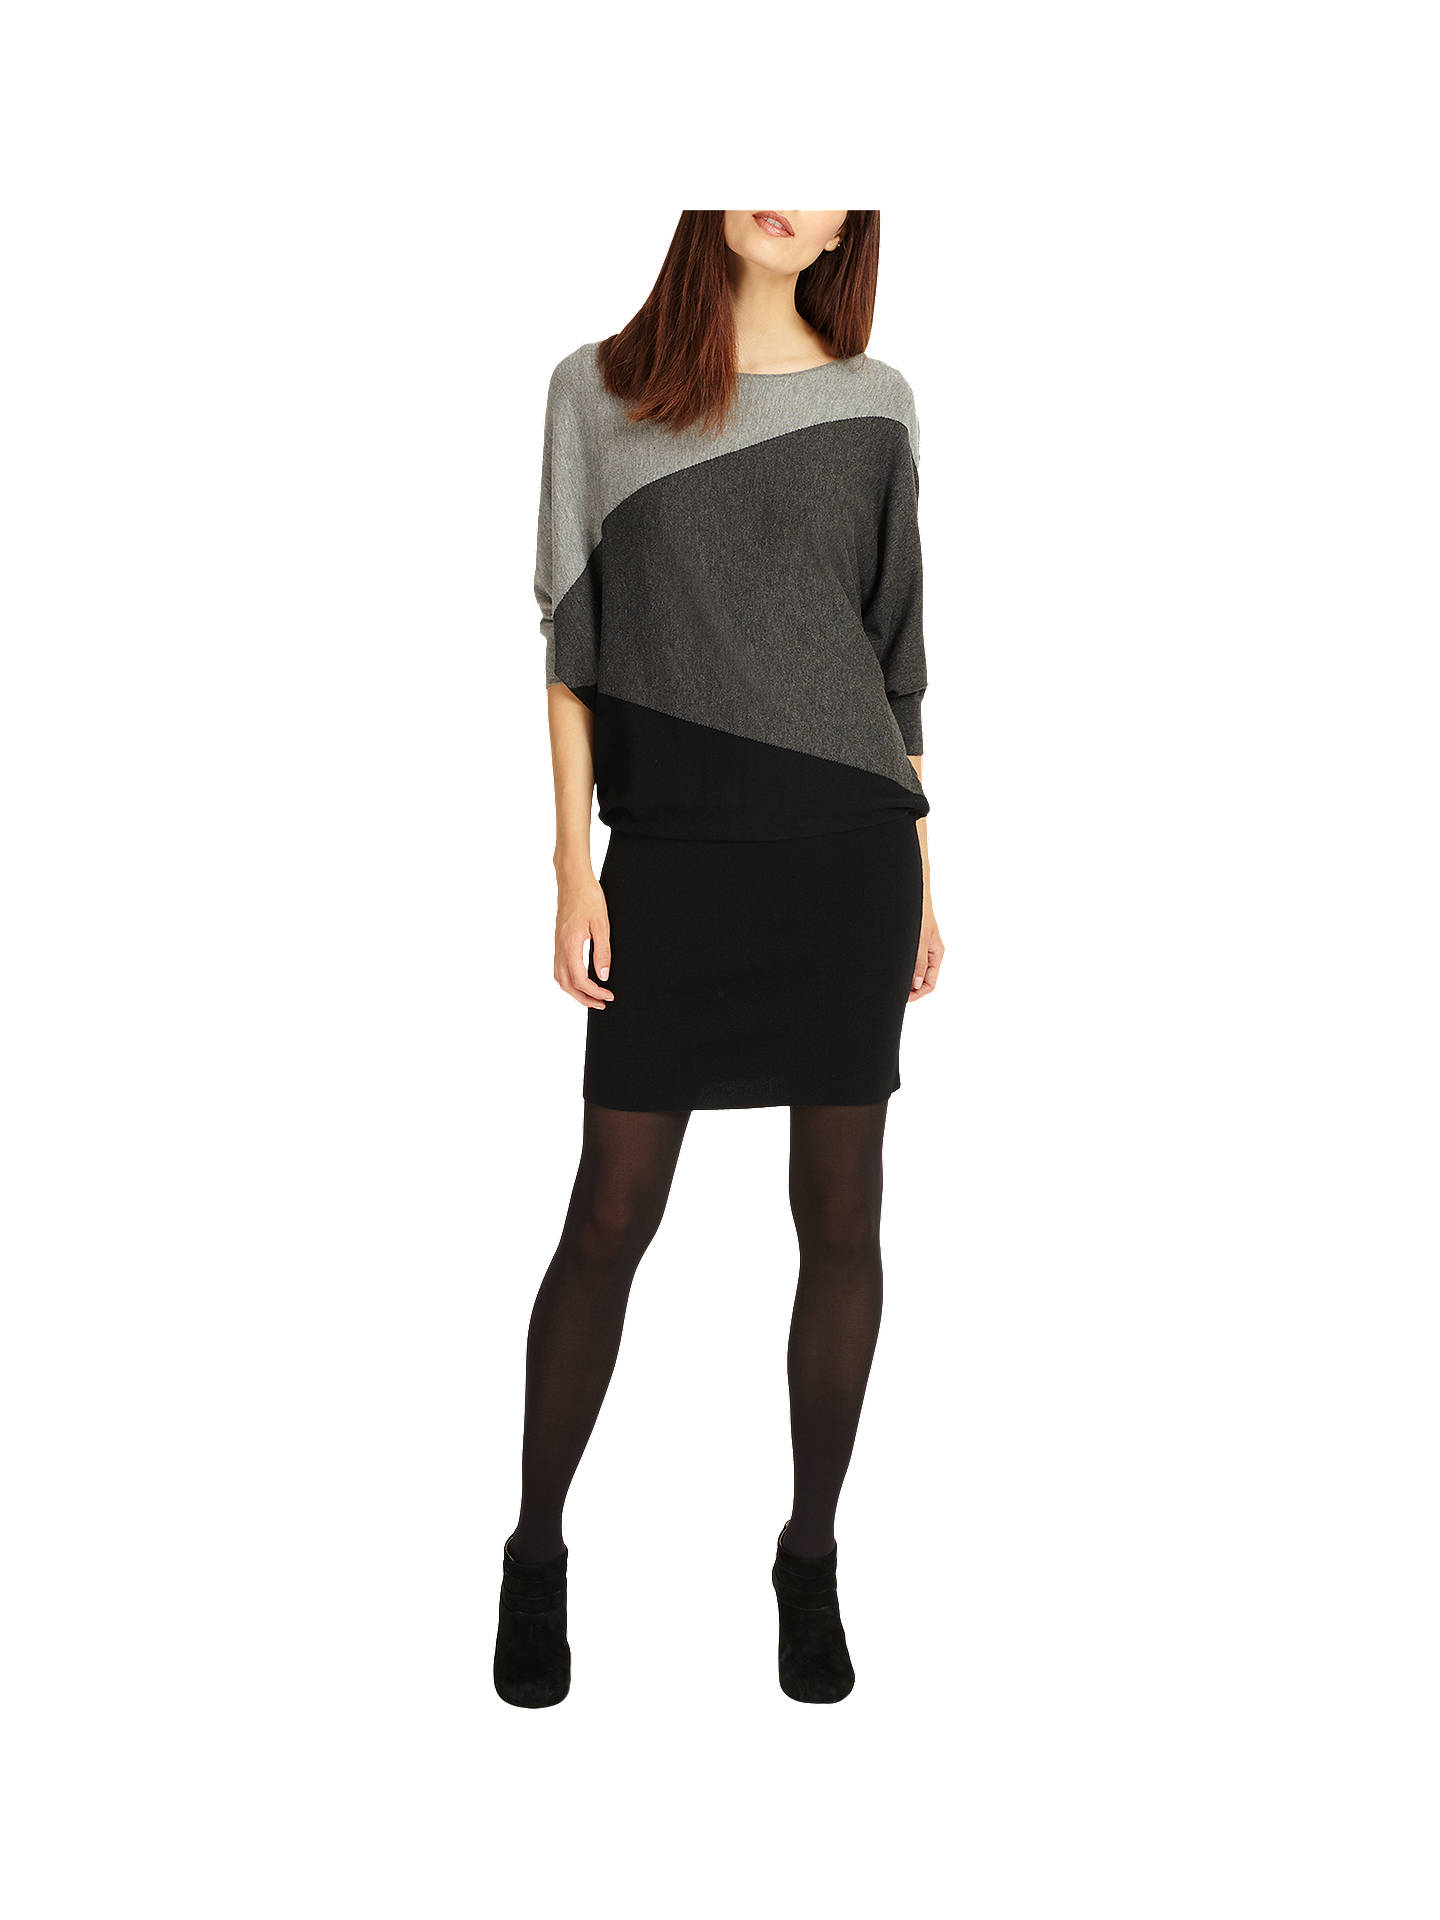 Phase Eight Becca Diagonal Block Dress Black Grey